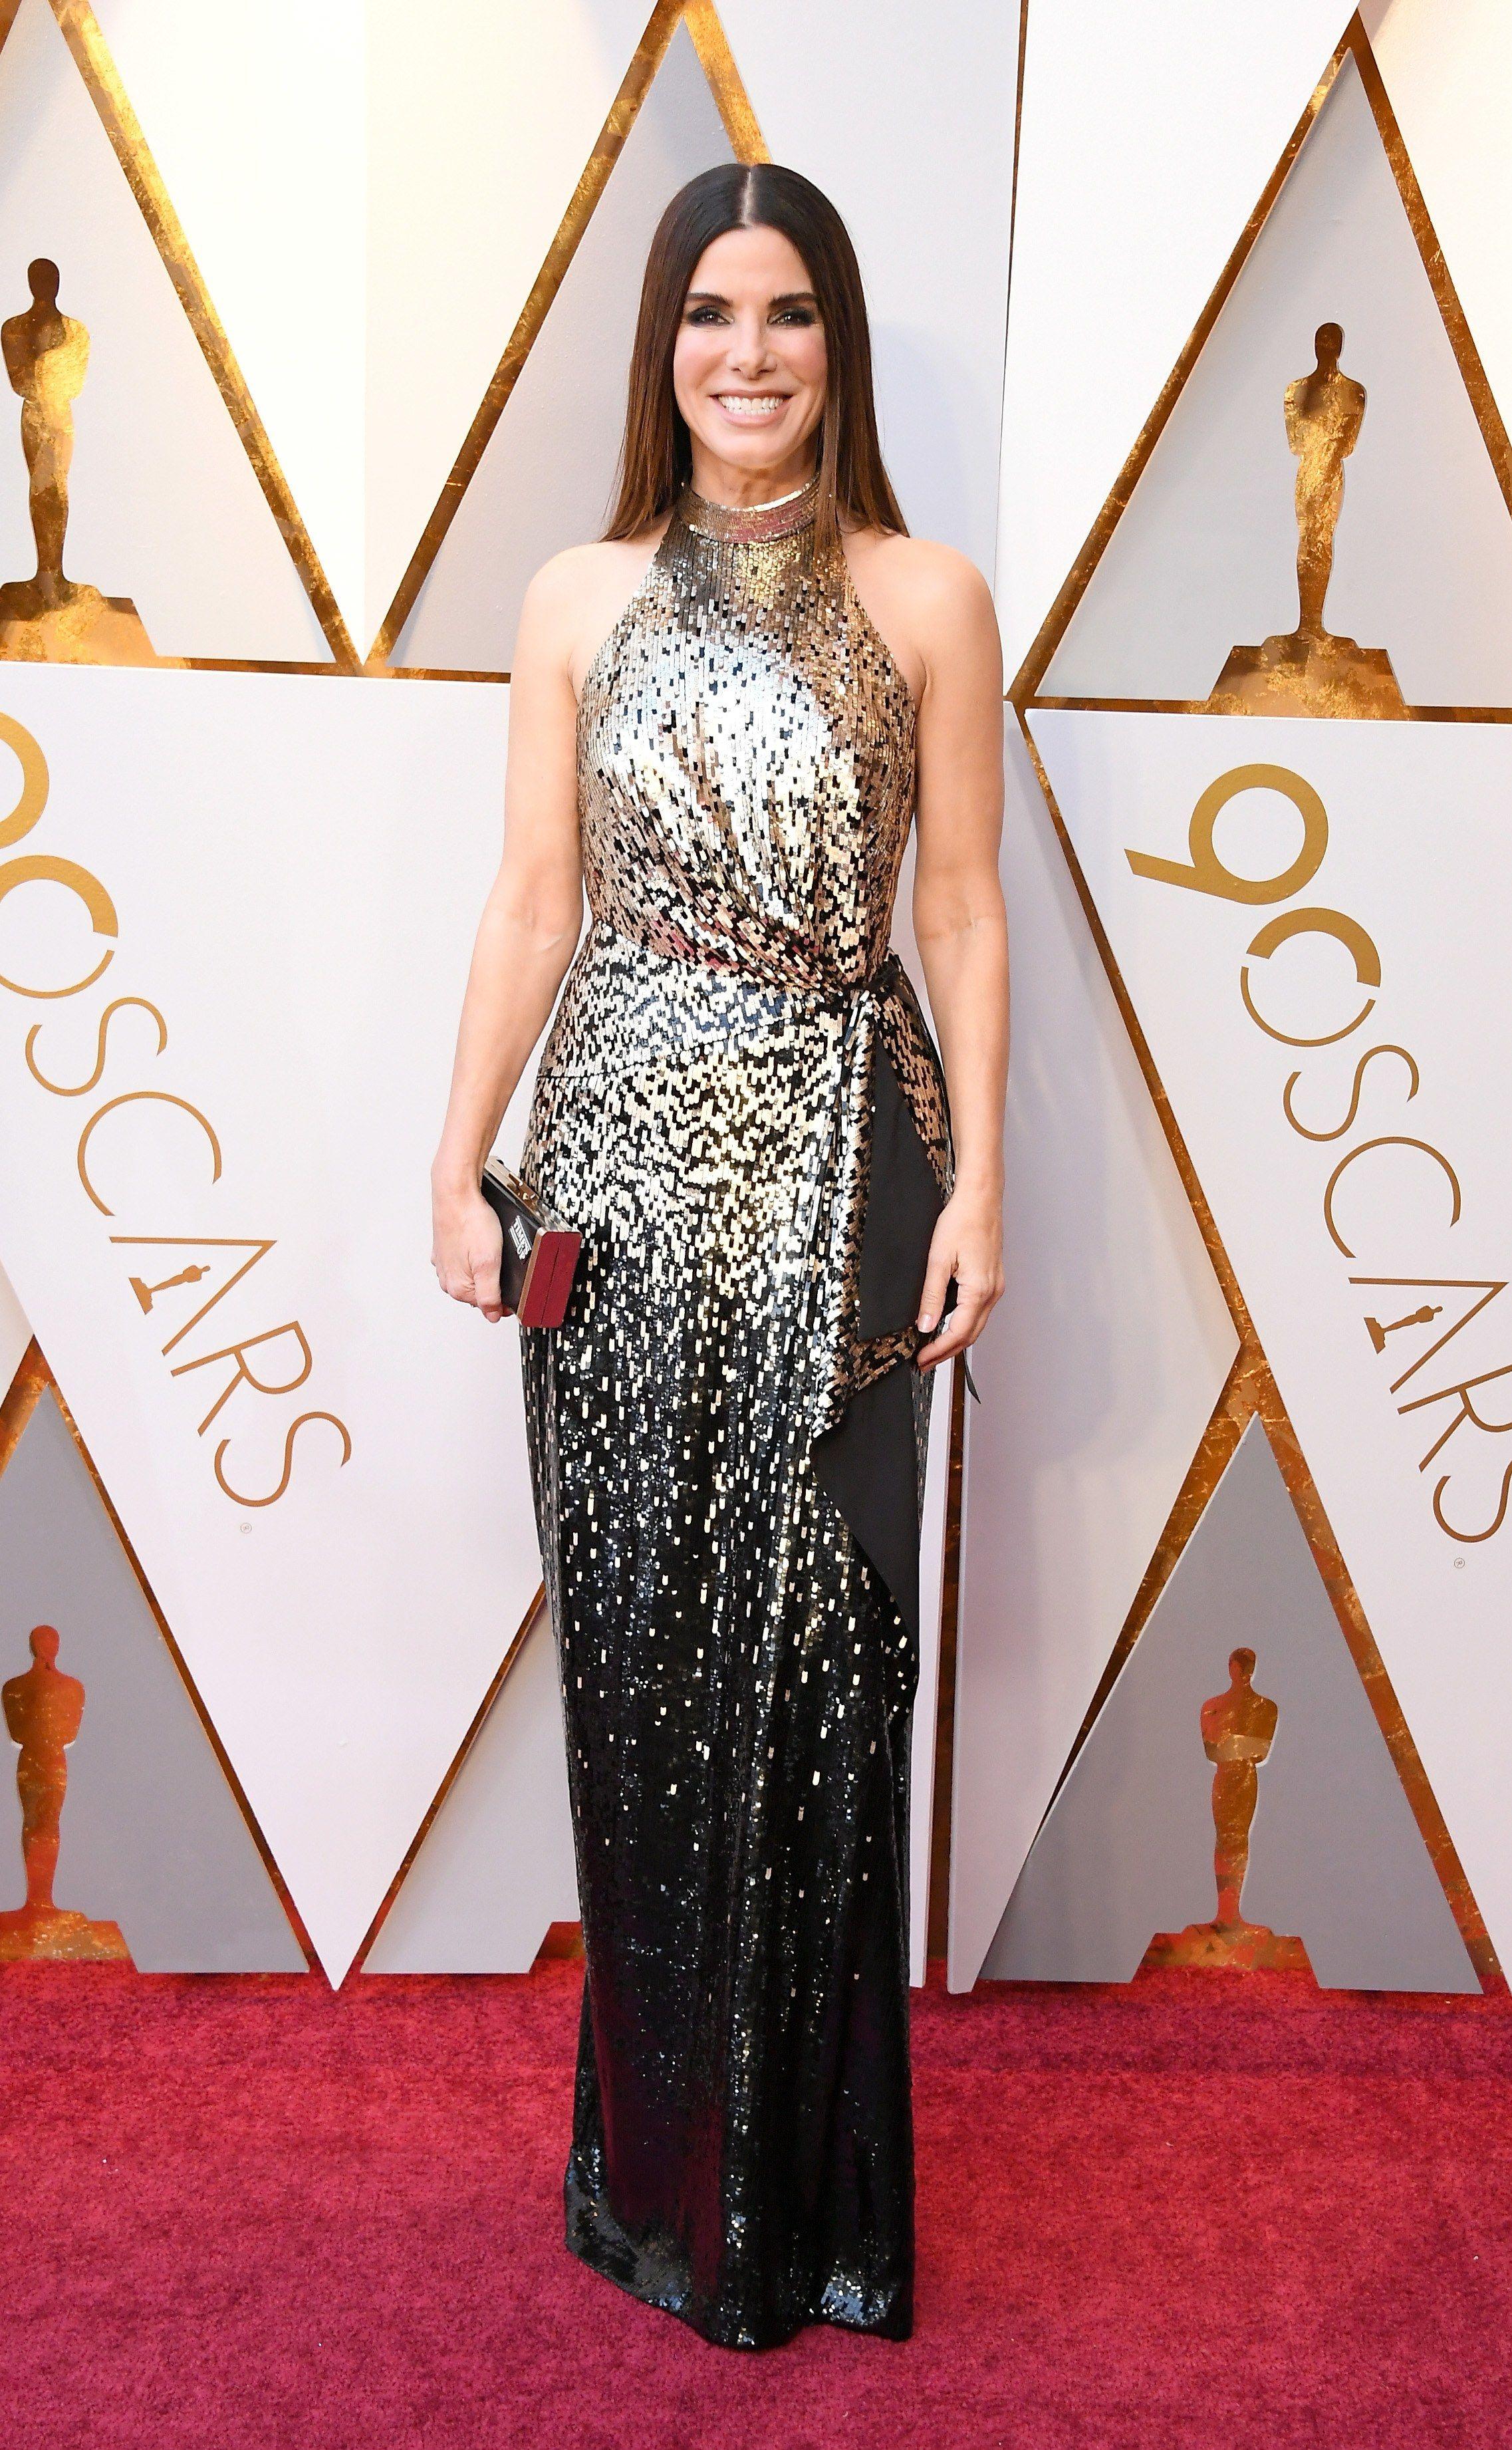 2018 Oscars - Sandra Bullock in Louis Vuitton and Zac Posen with Lorraine  Schwartz jewelry 8bc47d77b